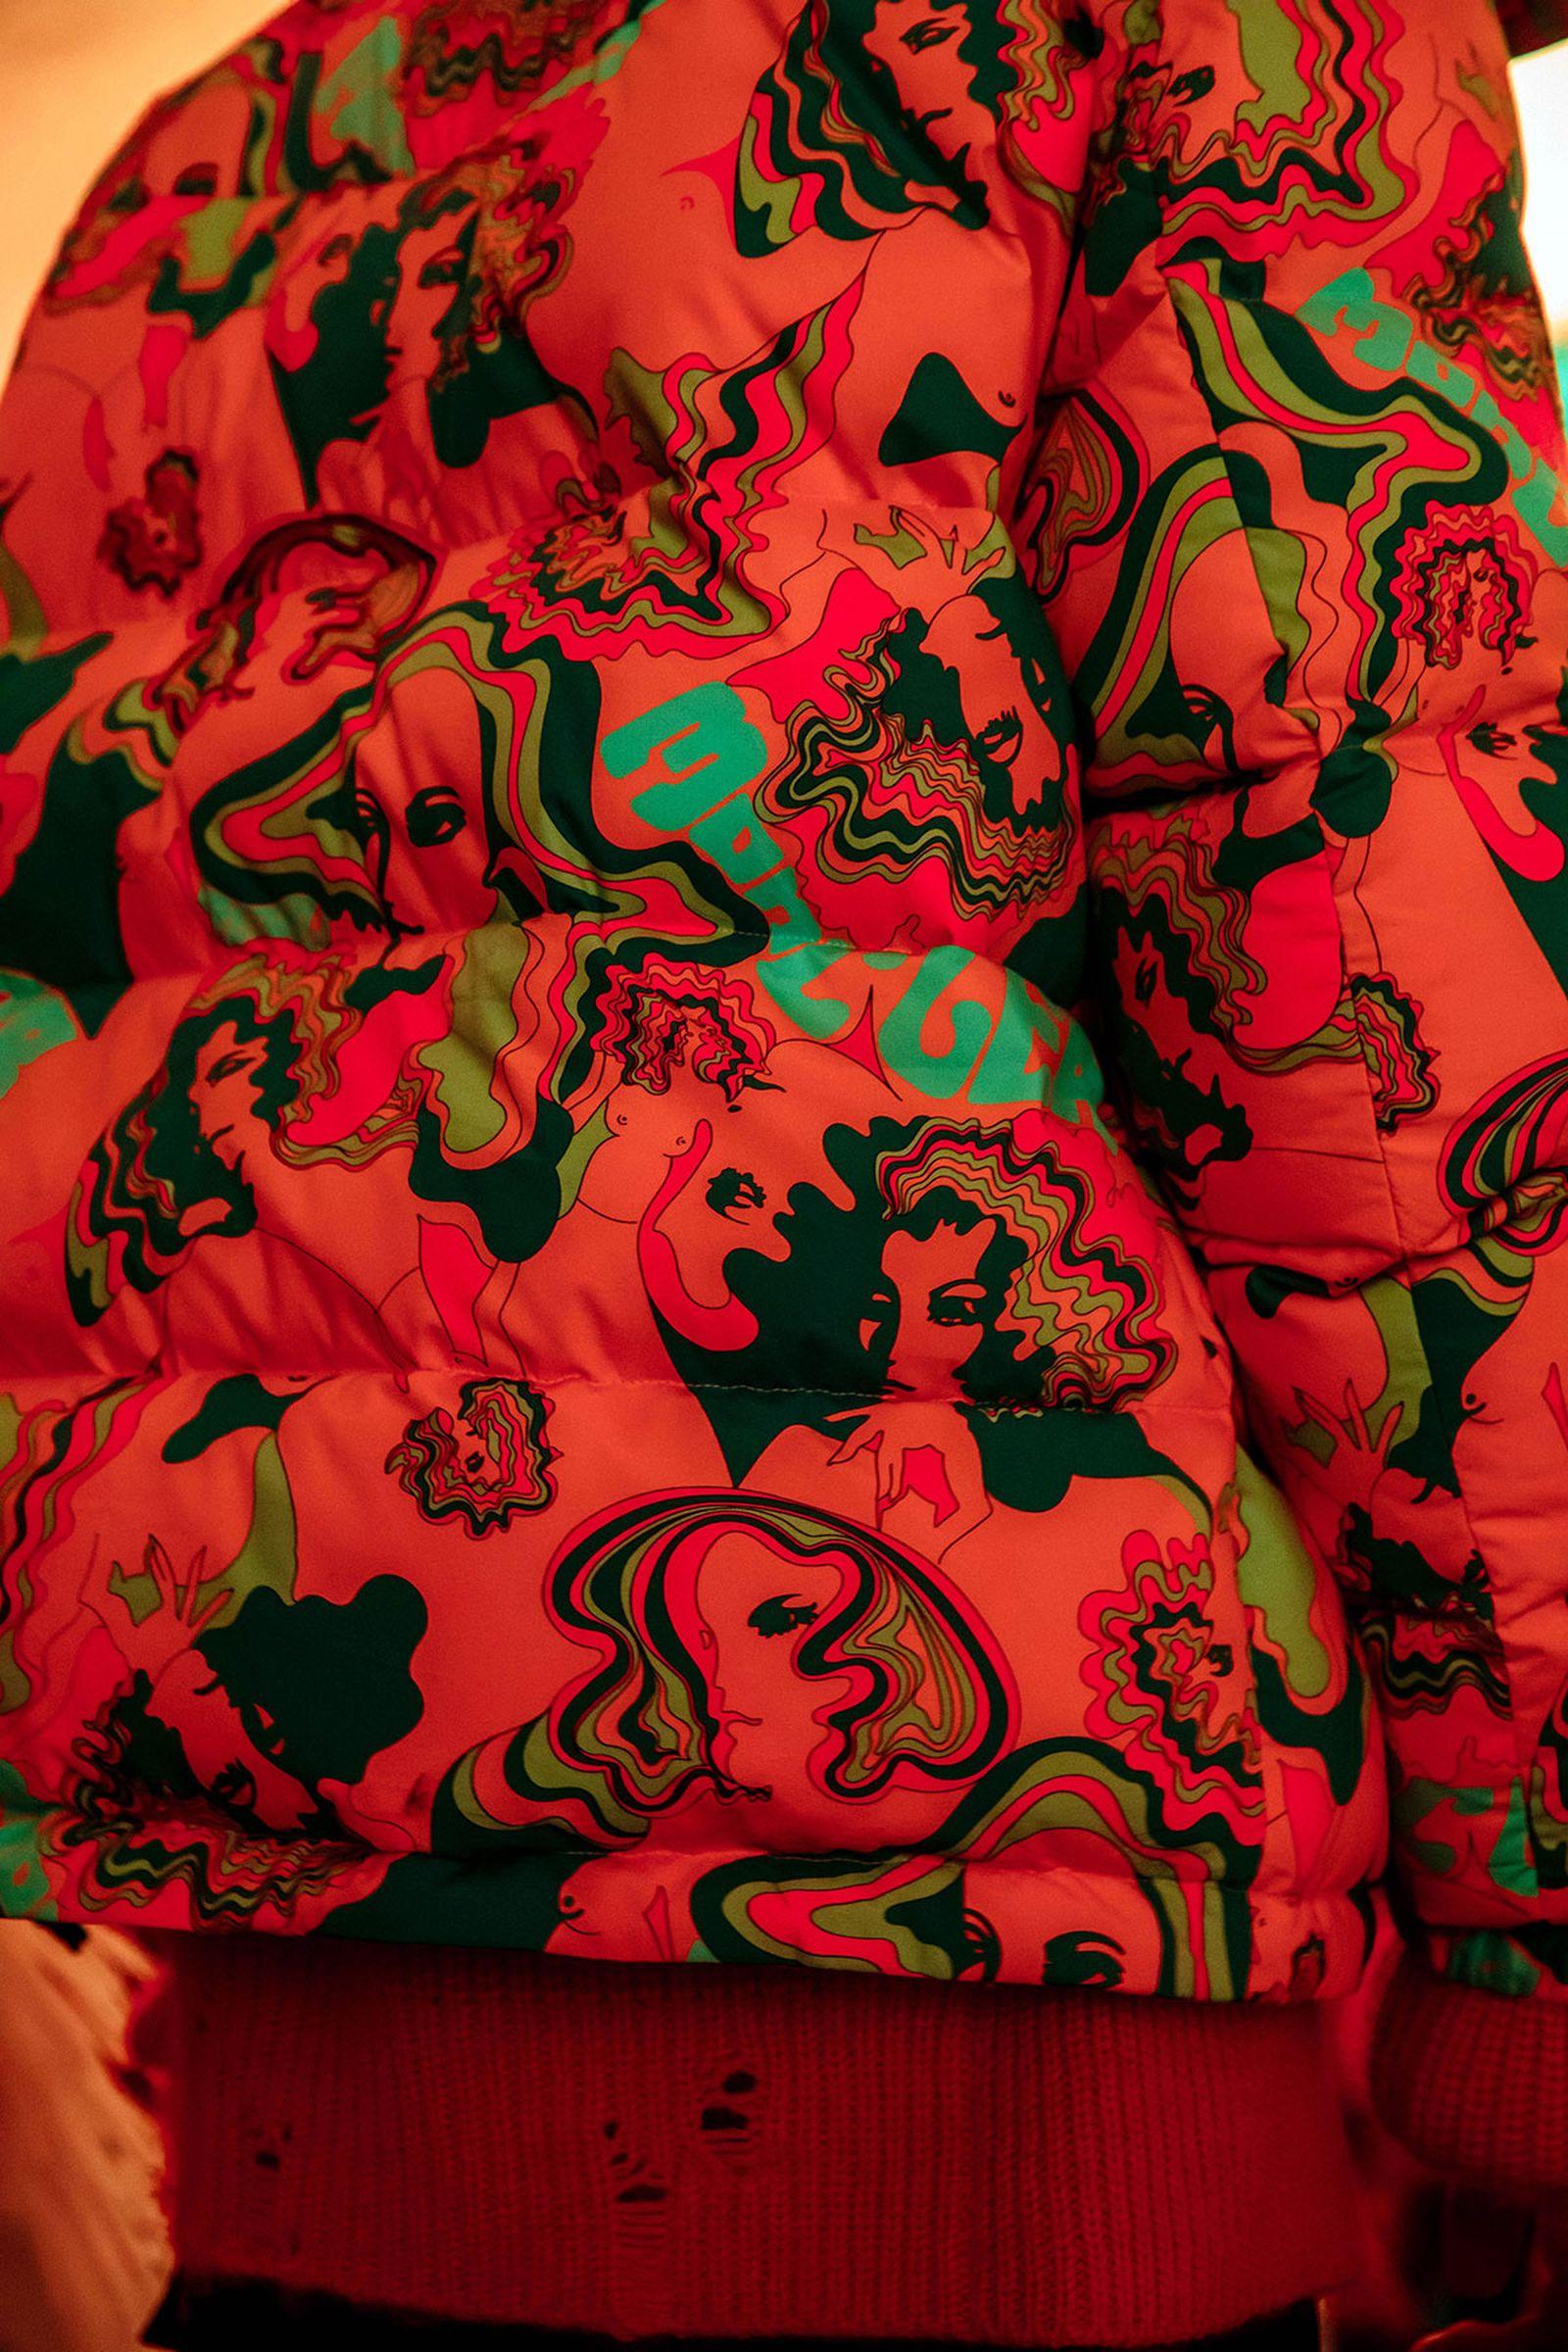 moncler genius fw19 grenoble 1017 ALYX 9SM Palm Angels craig green